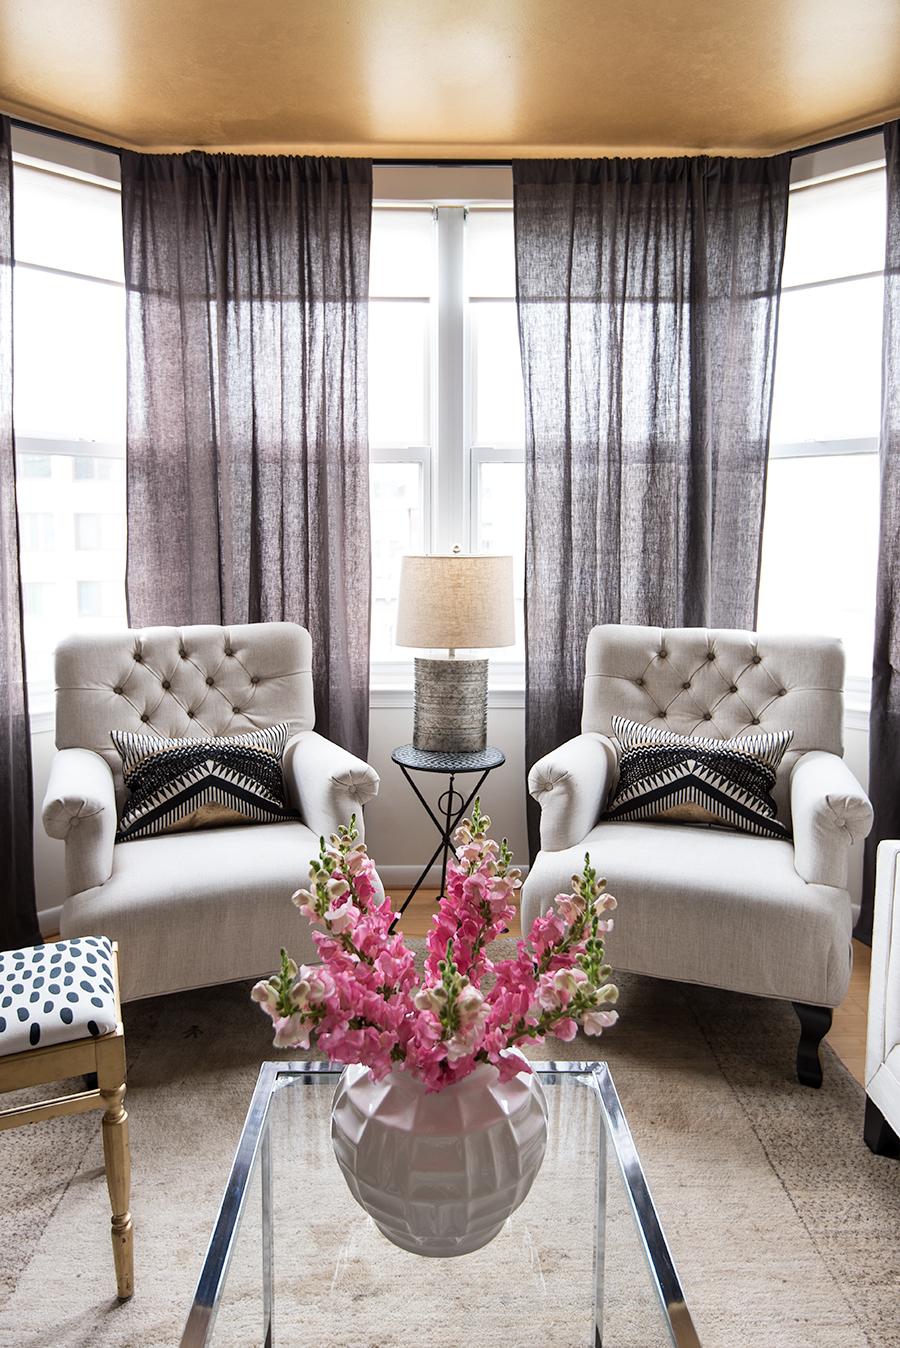 splendor-styling-decoration-dc-home-styling-gold-ceiling-feng-shui.jpg